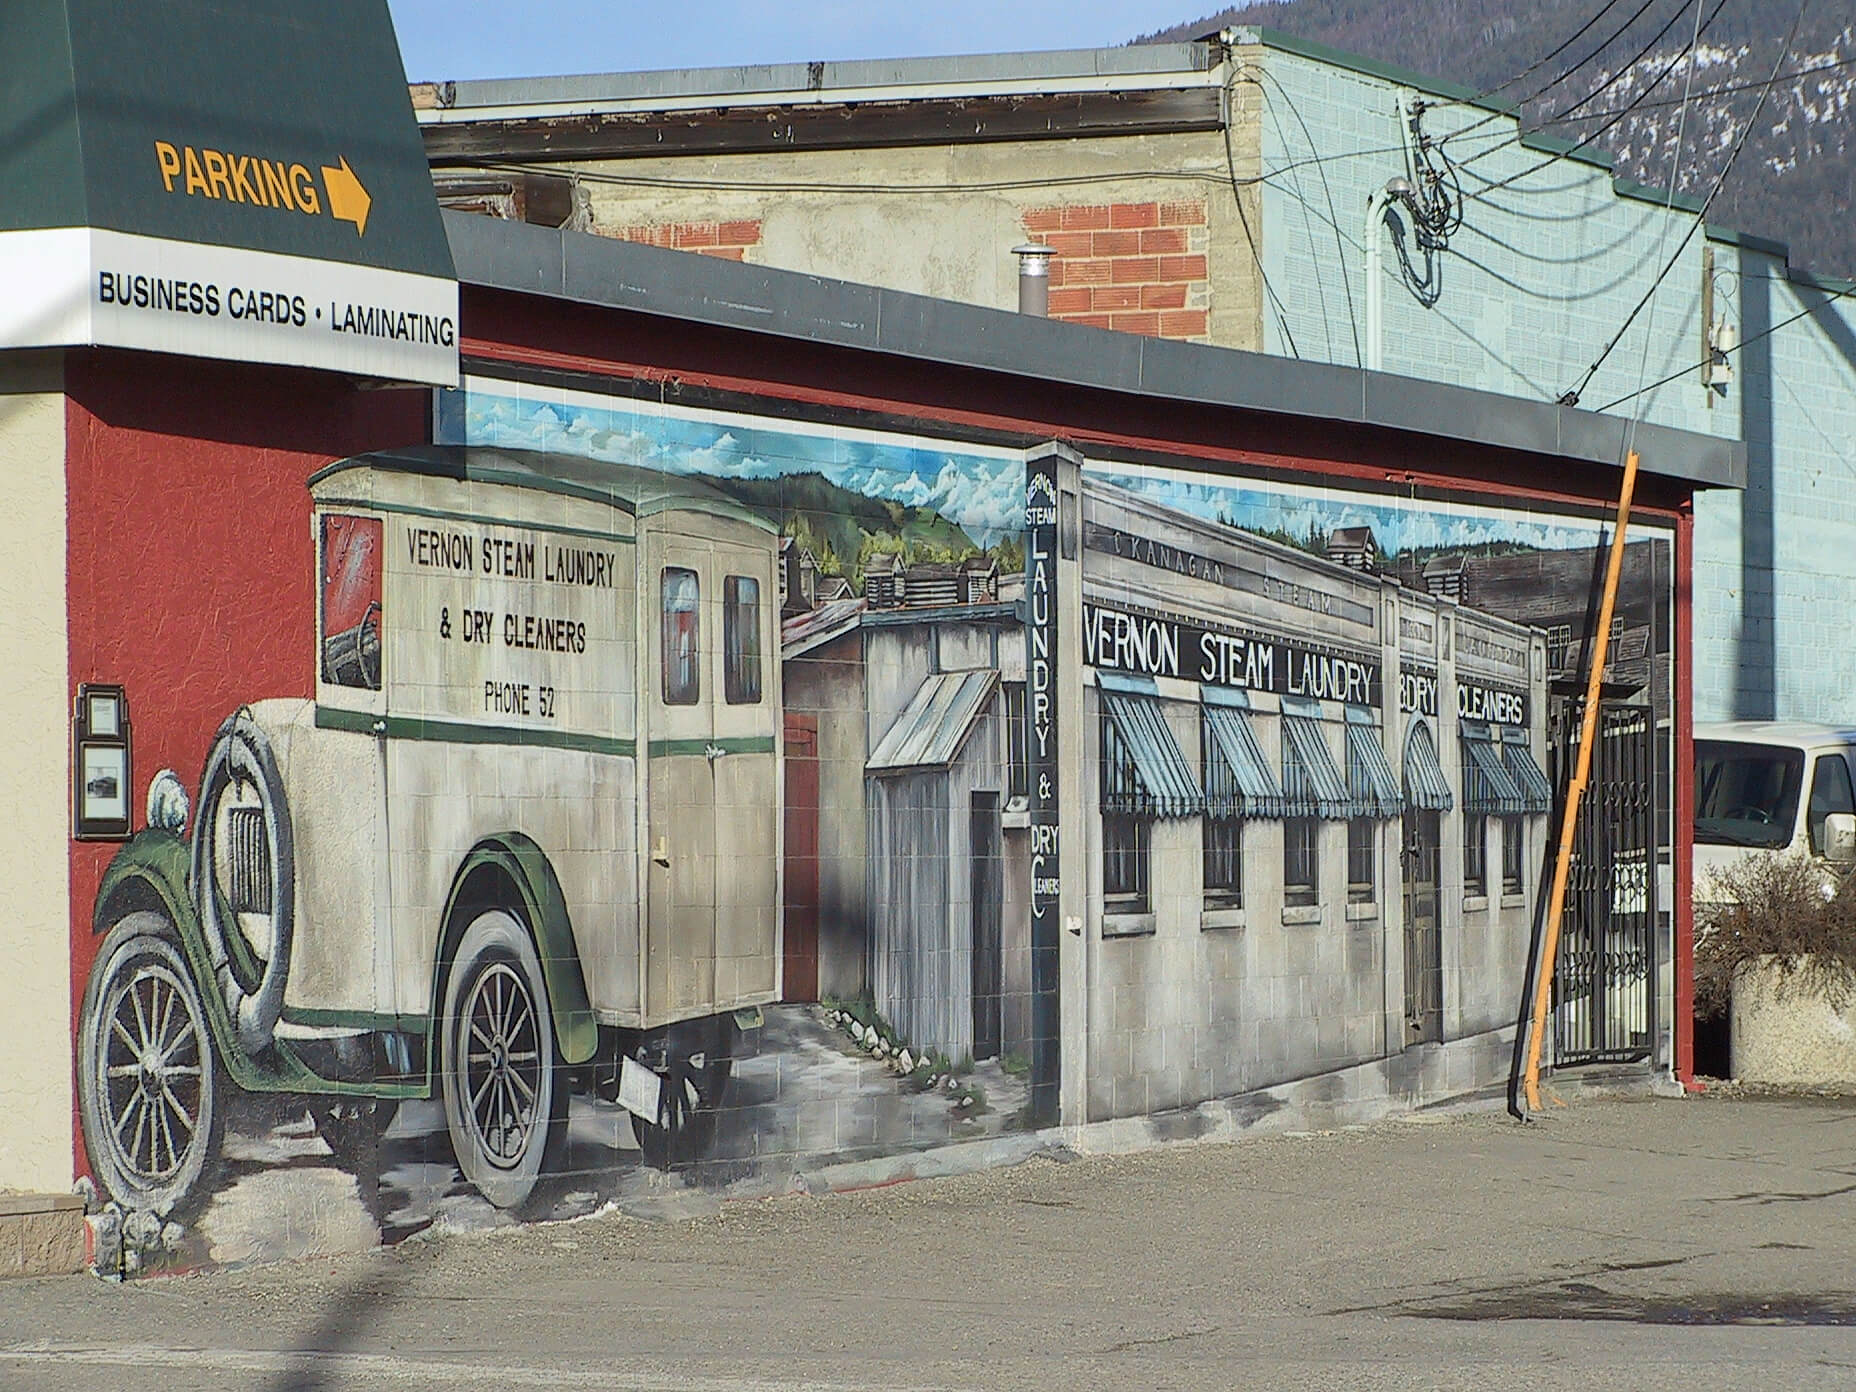 Vernon Steam Laundry